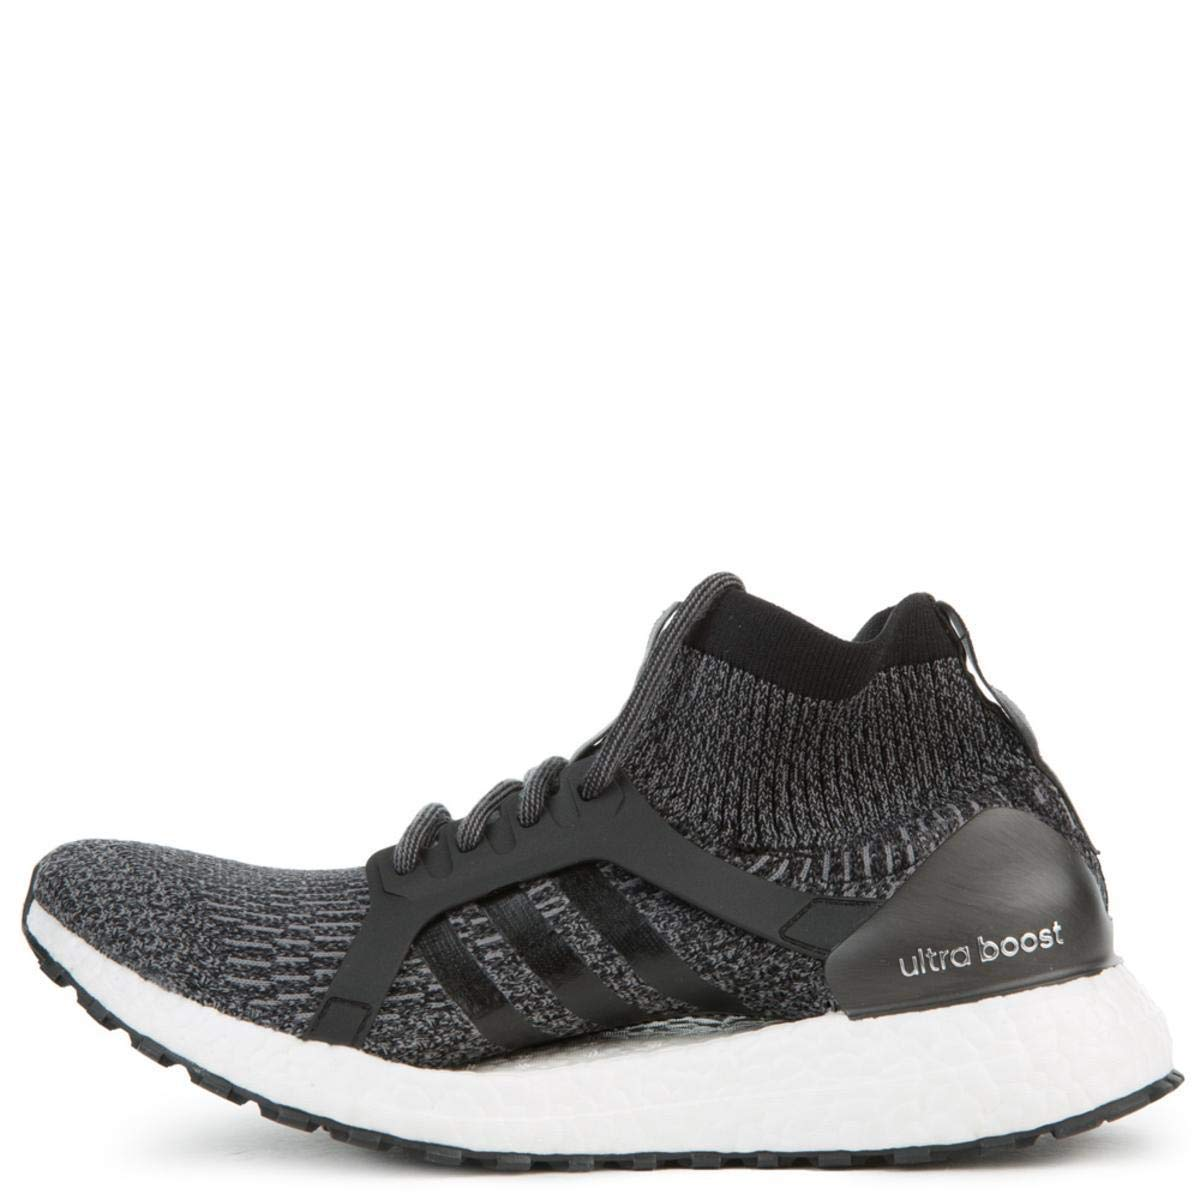 super popular d270c 7c139 adidas Ultraboost X Running Shoe - Core Black/Core Black/Utility Black -  Womens - 7